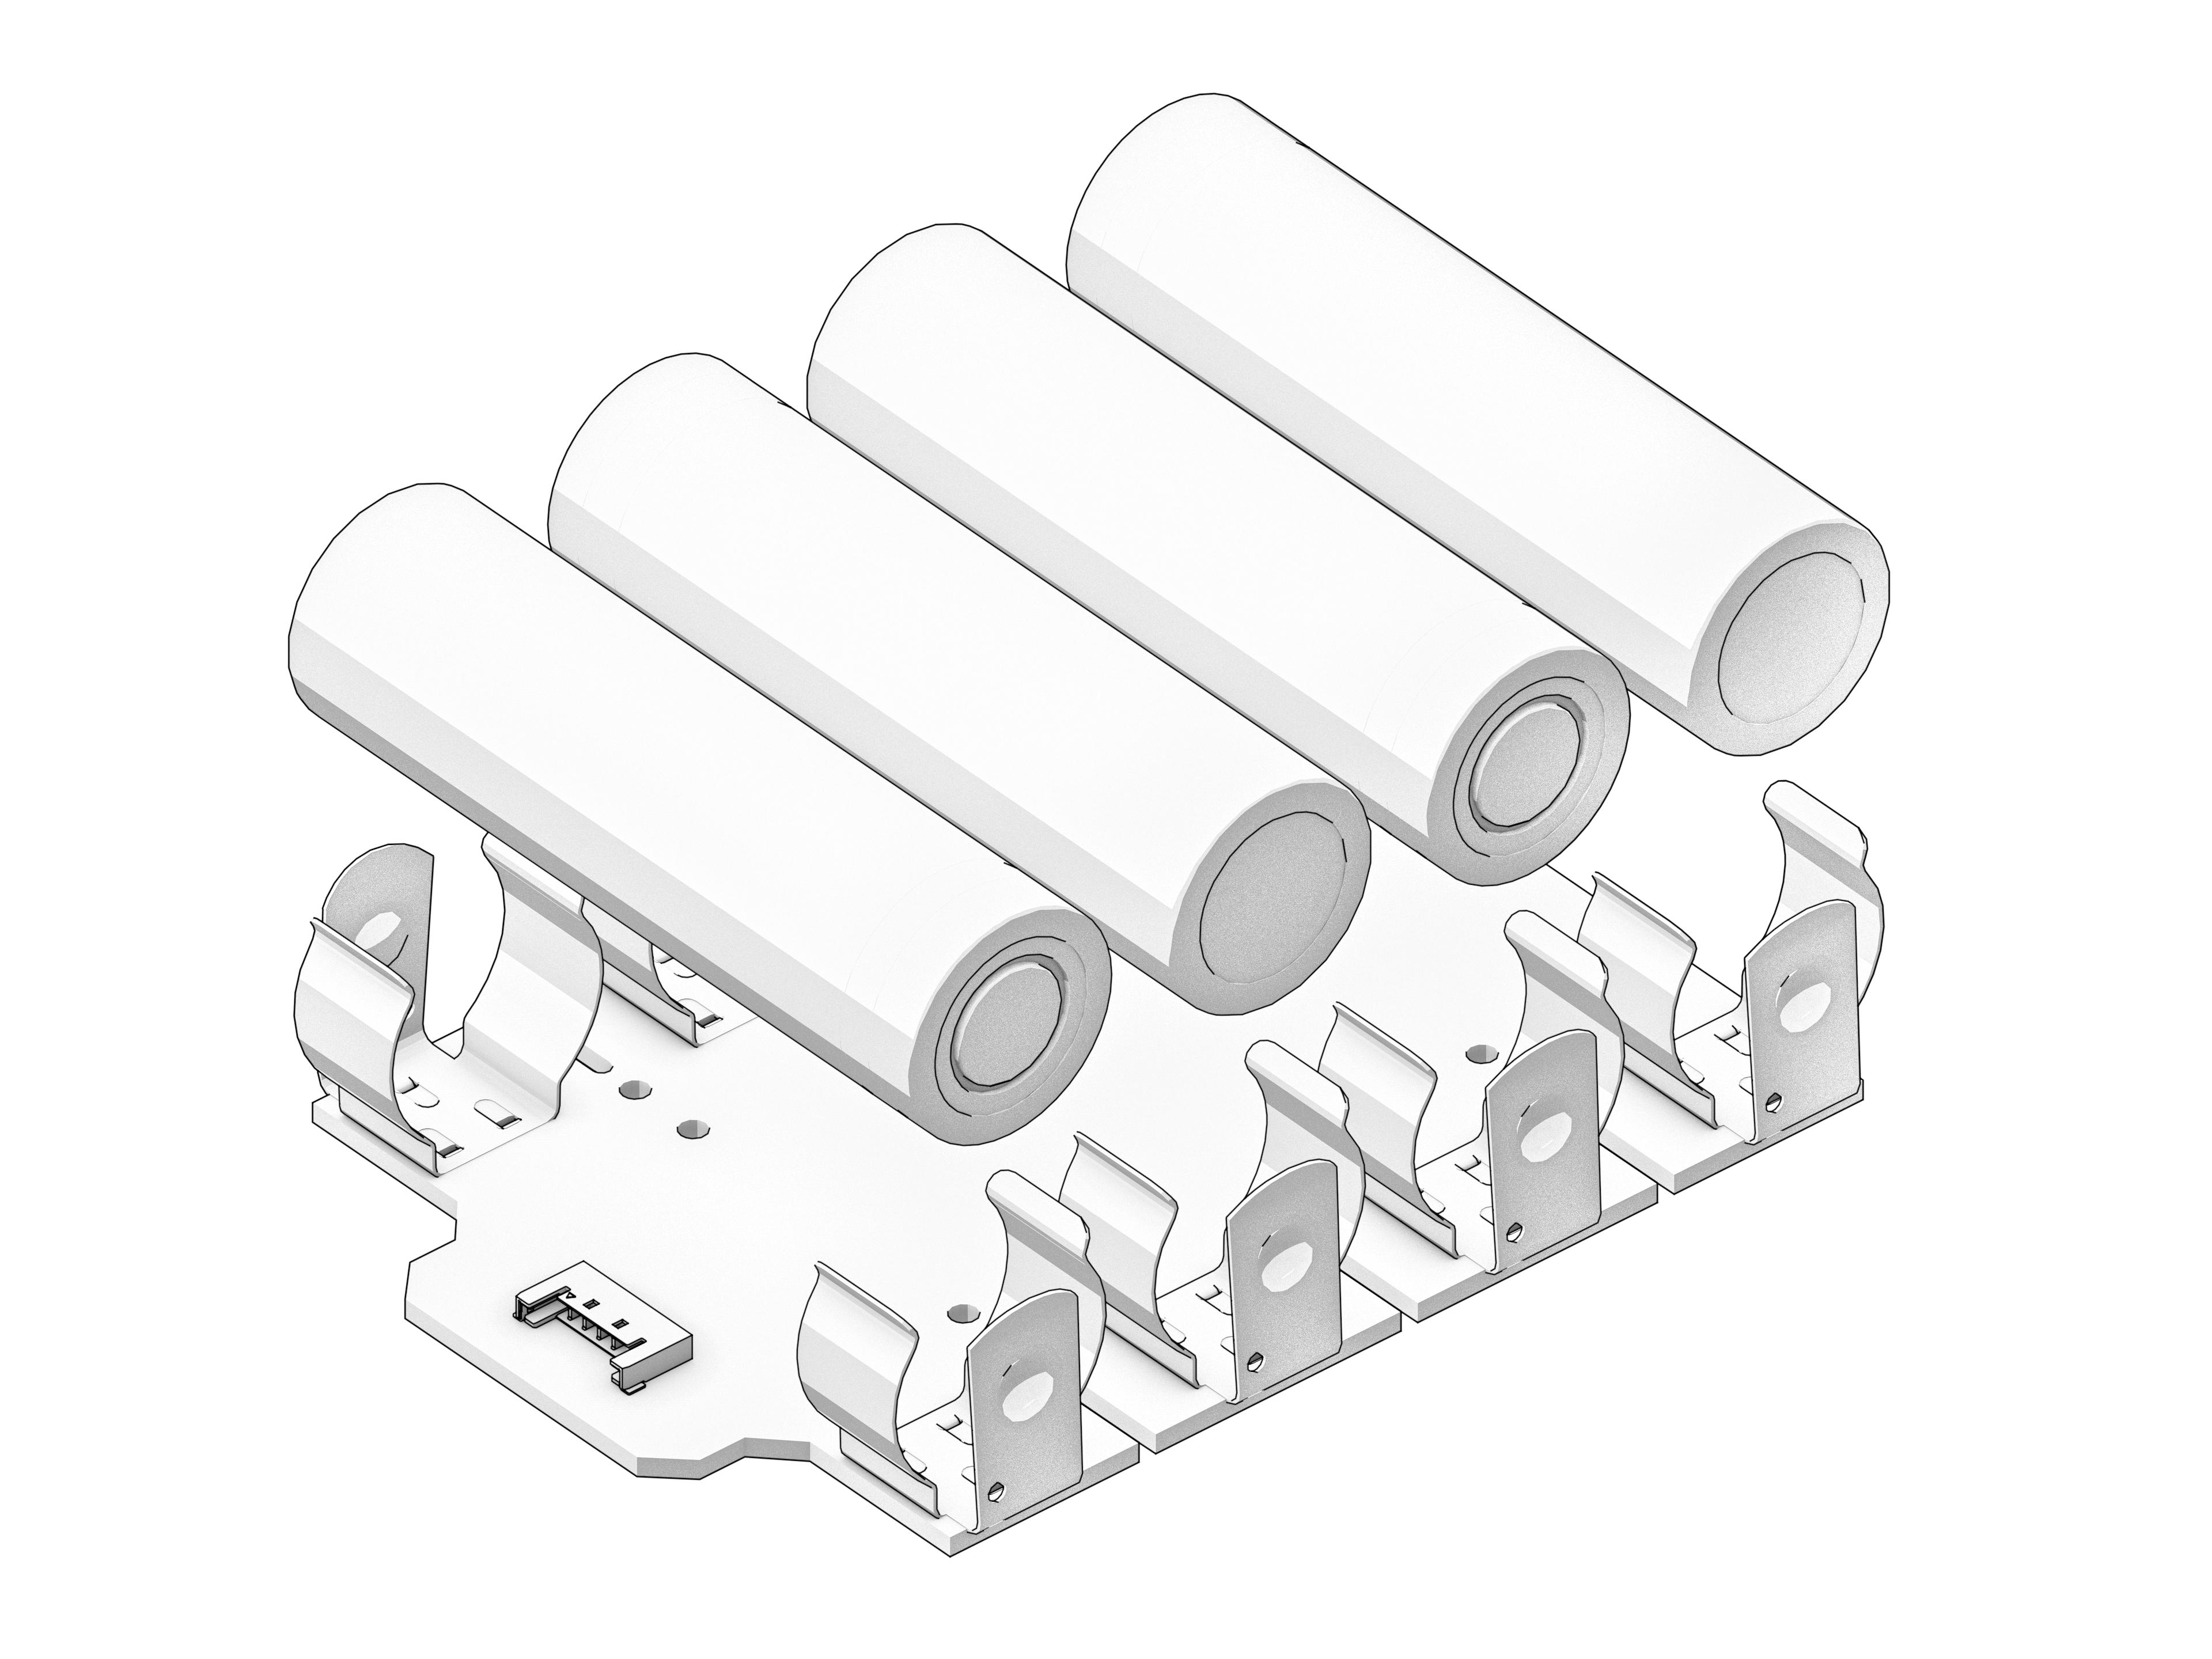 src/source/_static/illustrations/13.png